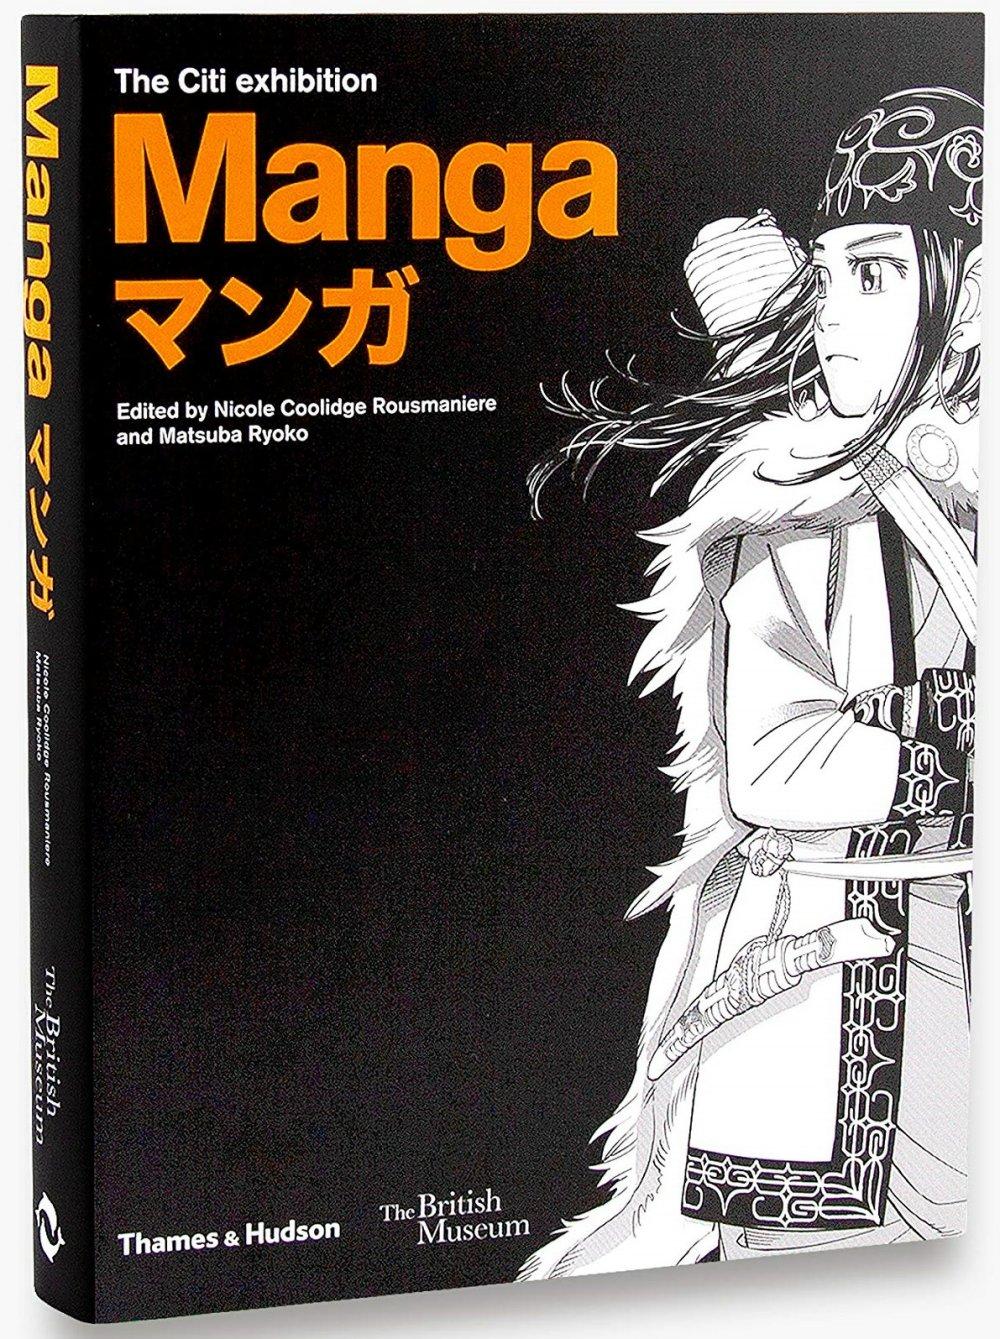 Manga (British Museum) 2019大英博物館《日本漫畫展》官方導覽書